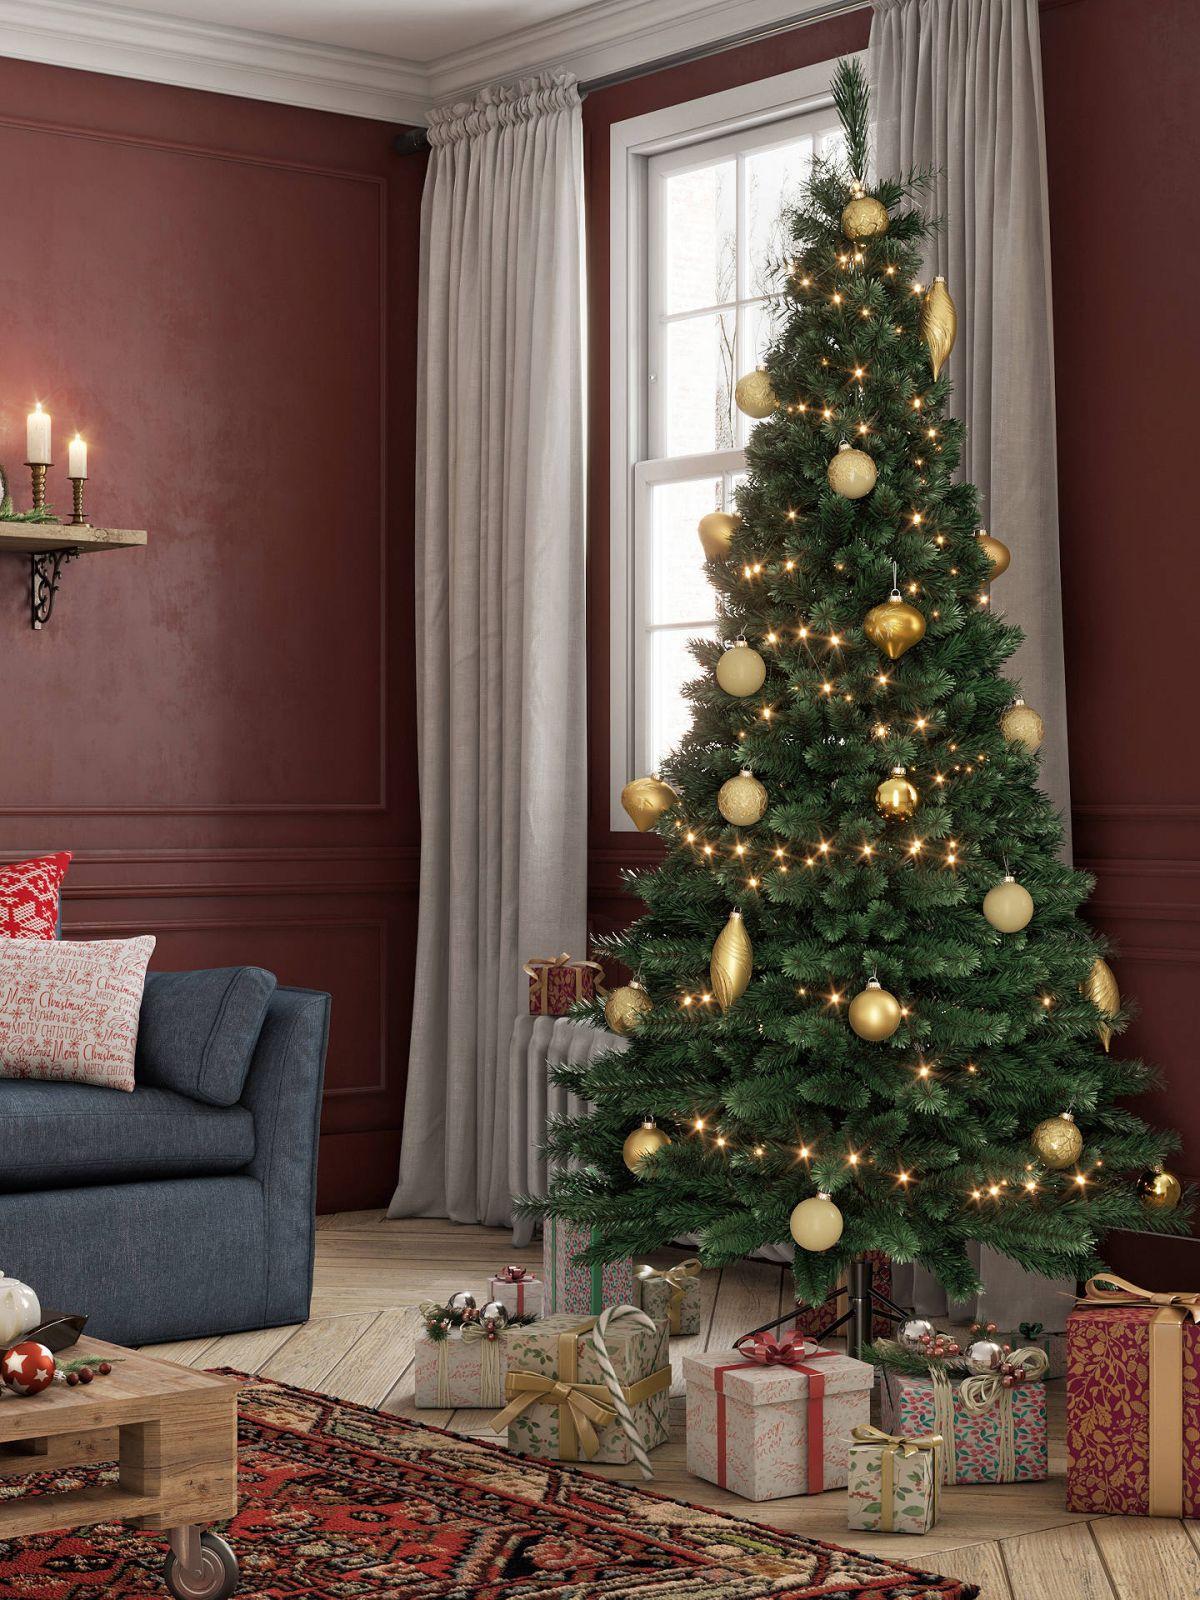 Kelly Hoppen's Christmas masterclass